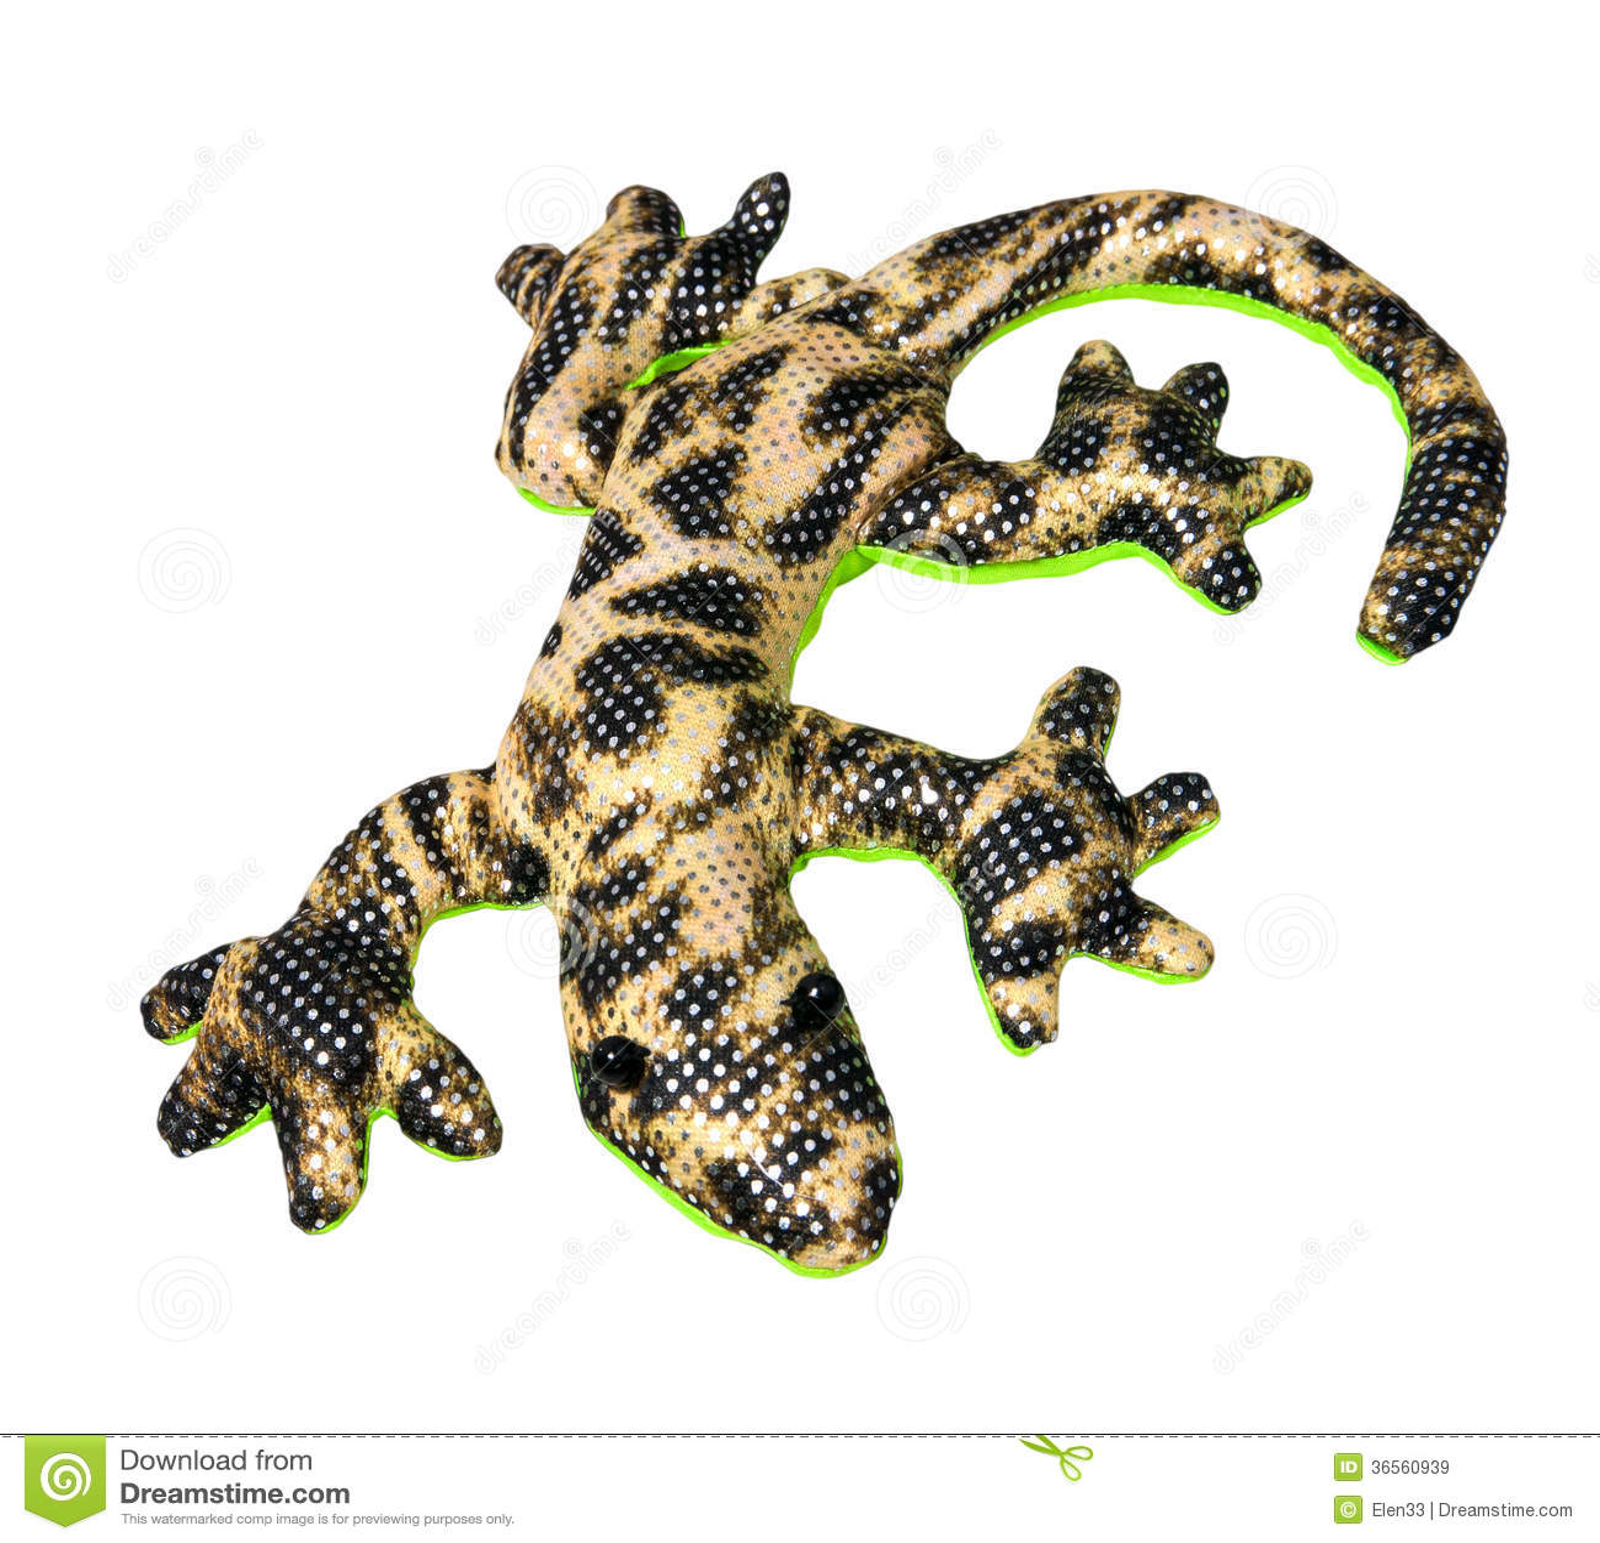 Hansa Tiger Salamander Plush Stuffed Toy Animal #5226